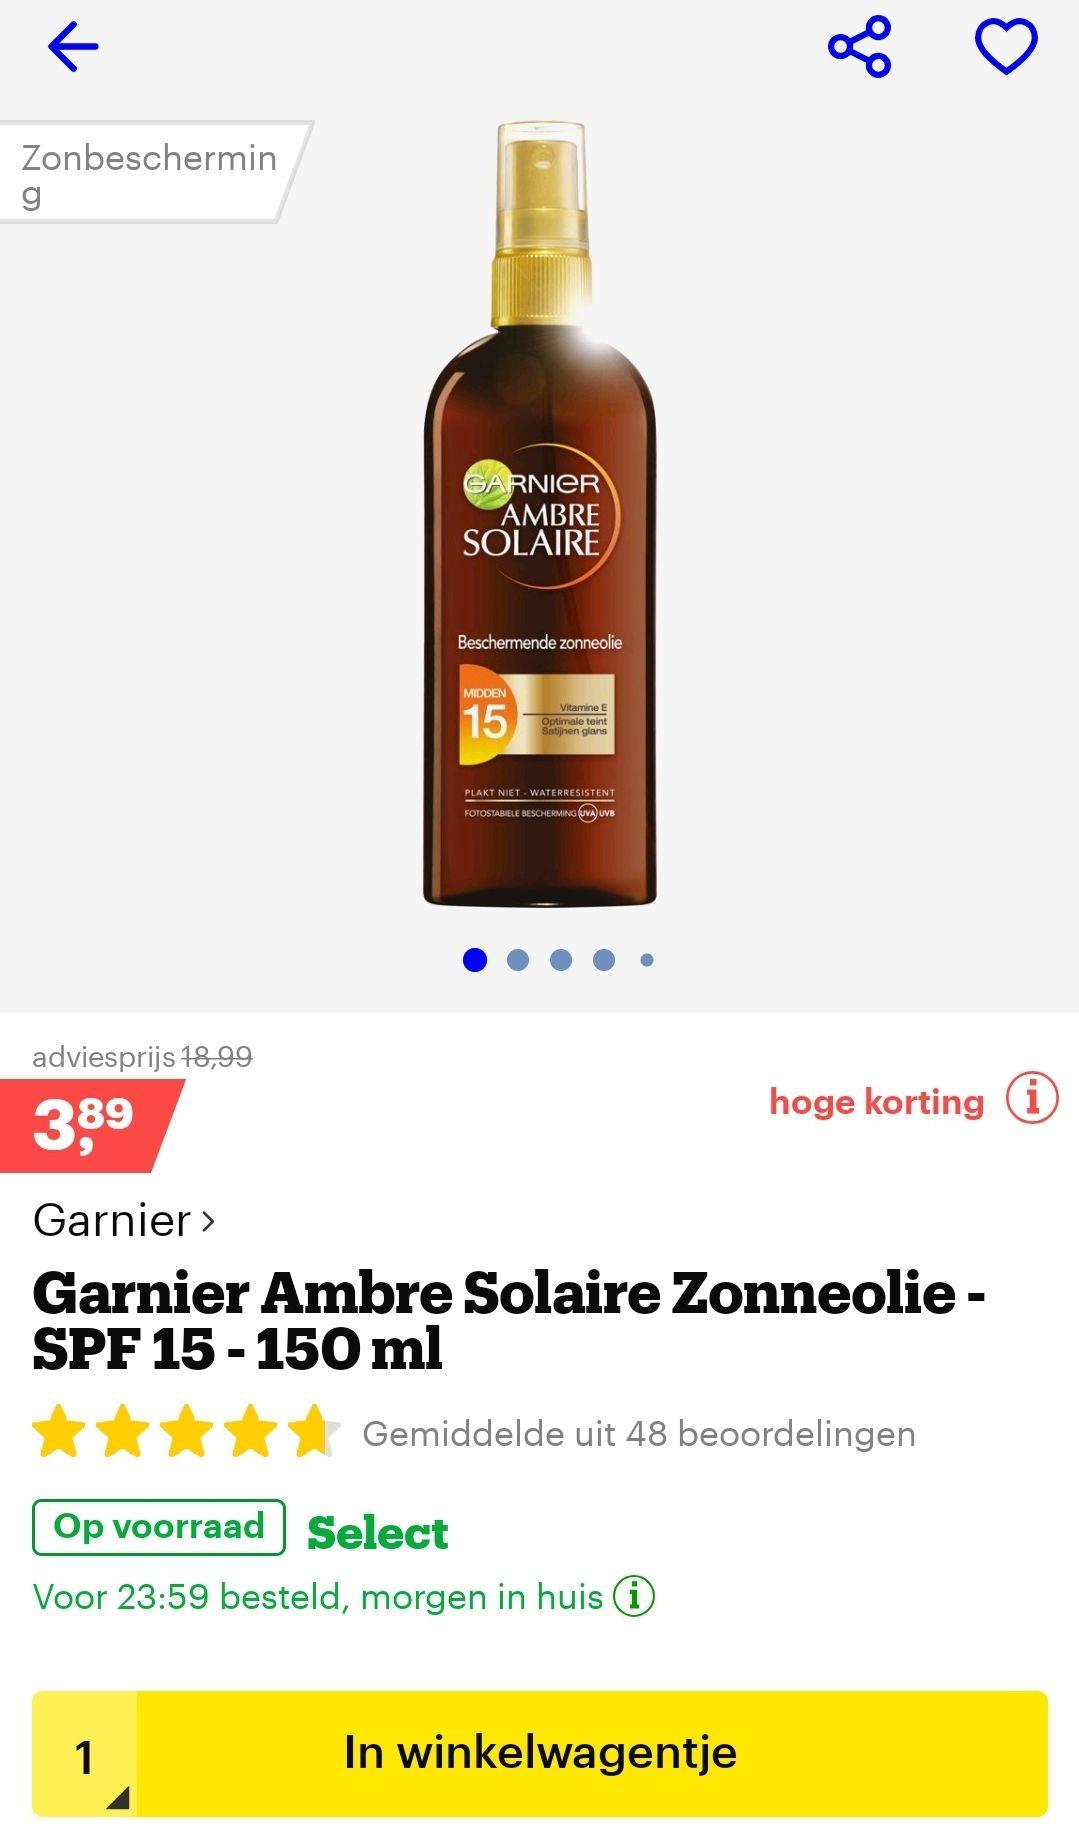 Garnier ambre solaire zonneolie SPF15